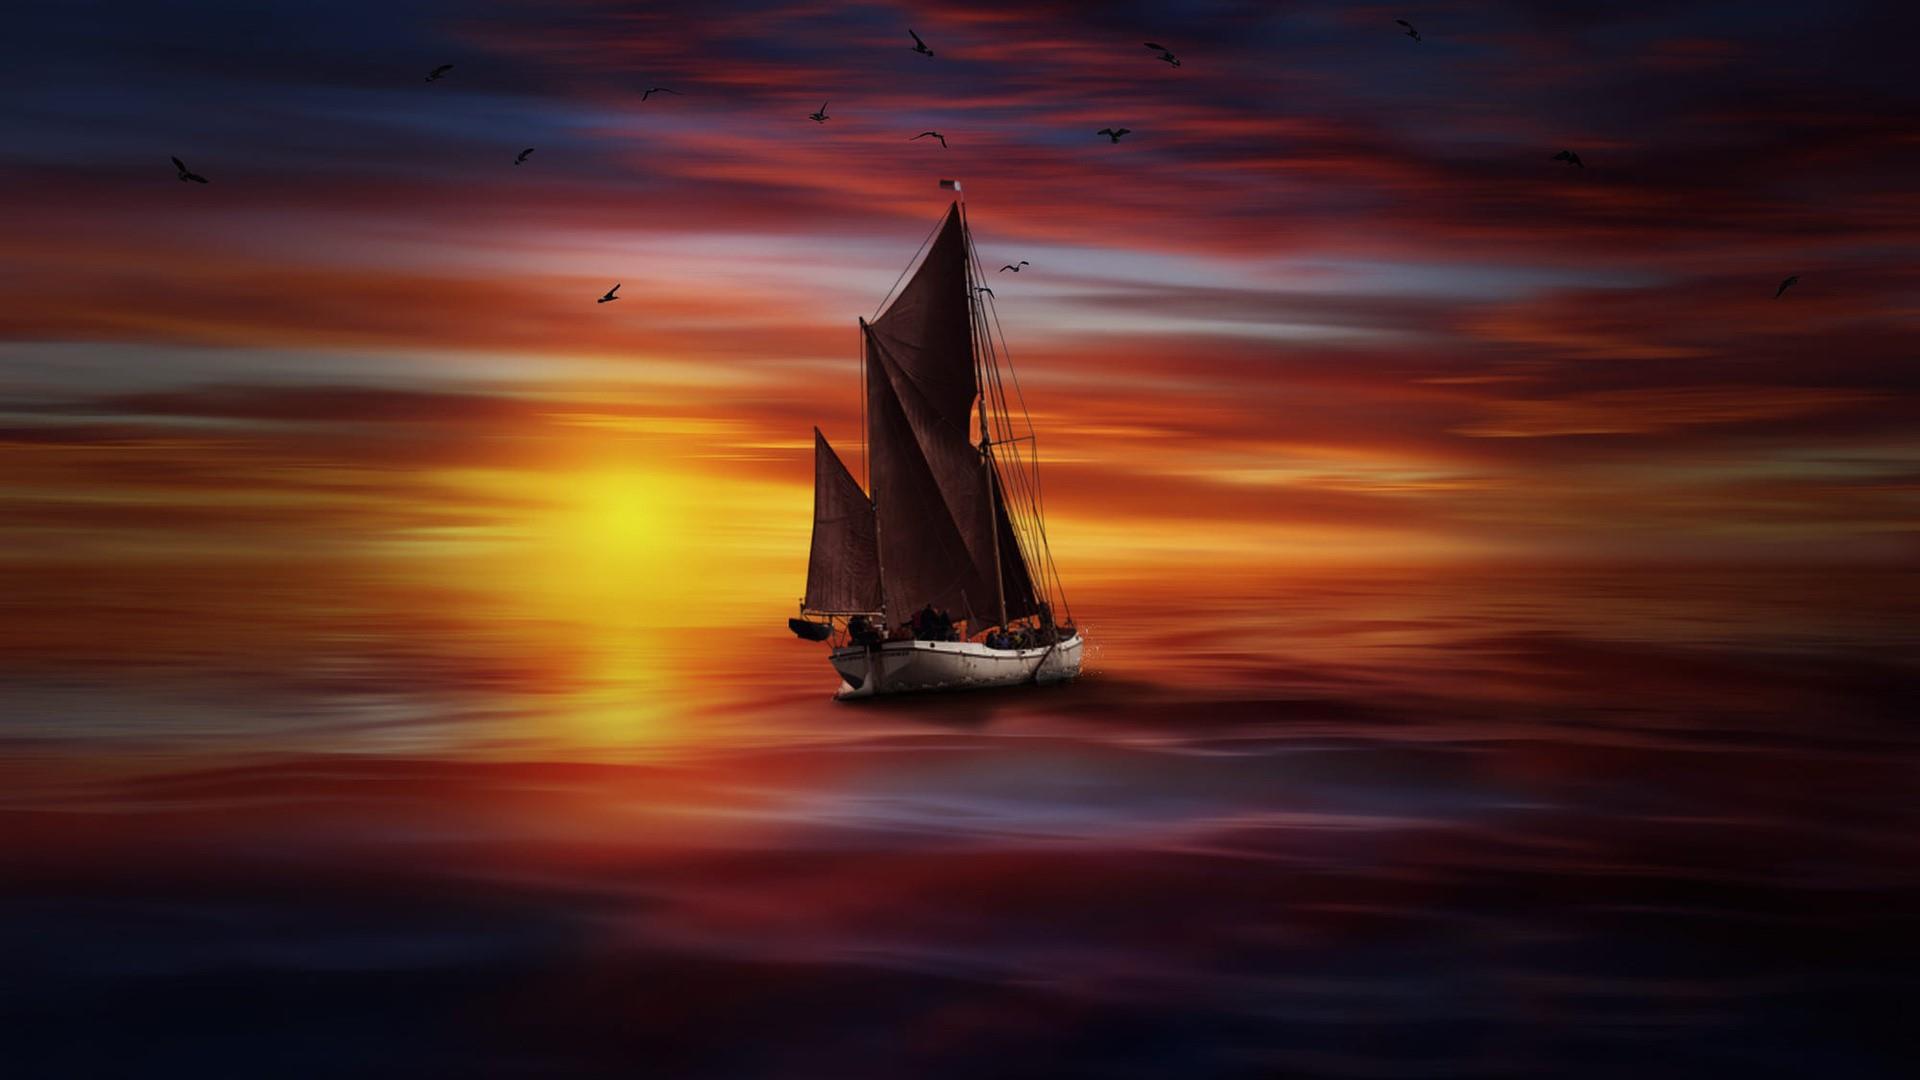 Sailboat in the sunset - Digital art wallpaper